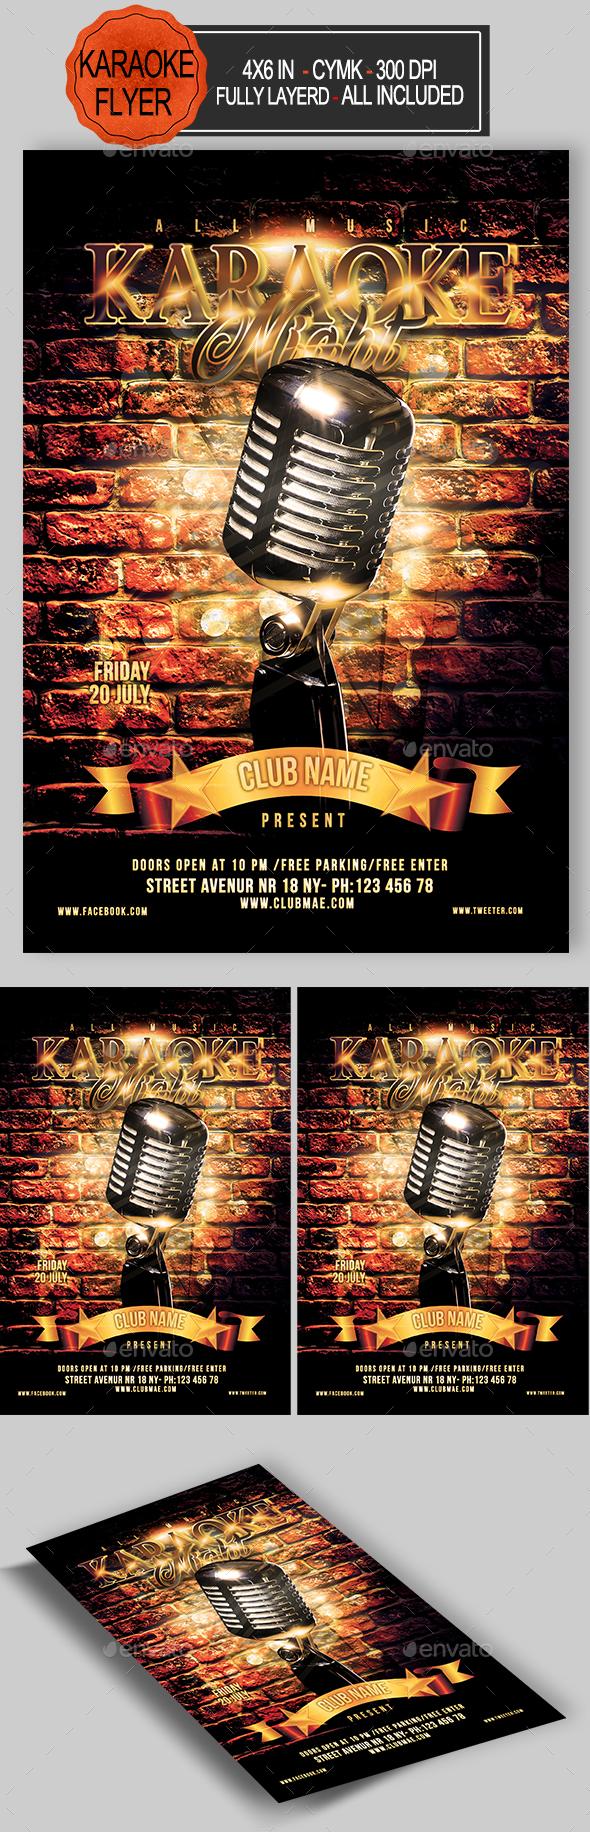 GraphicRiver Karaoke Flyer 21137171